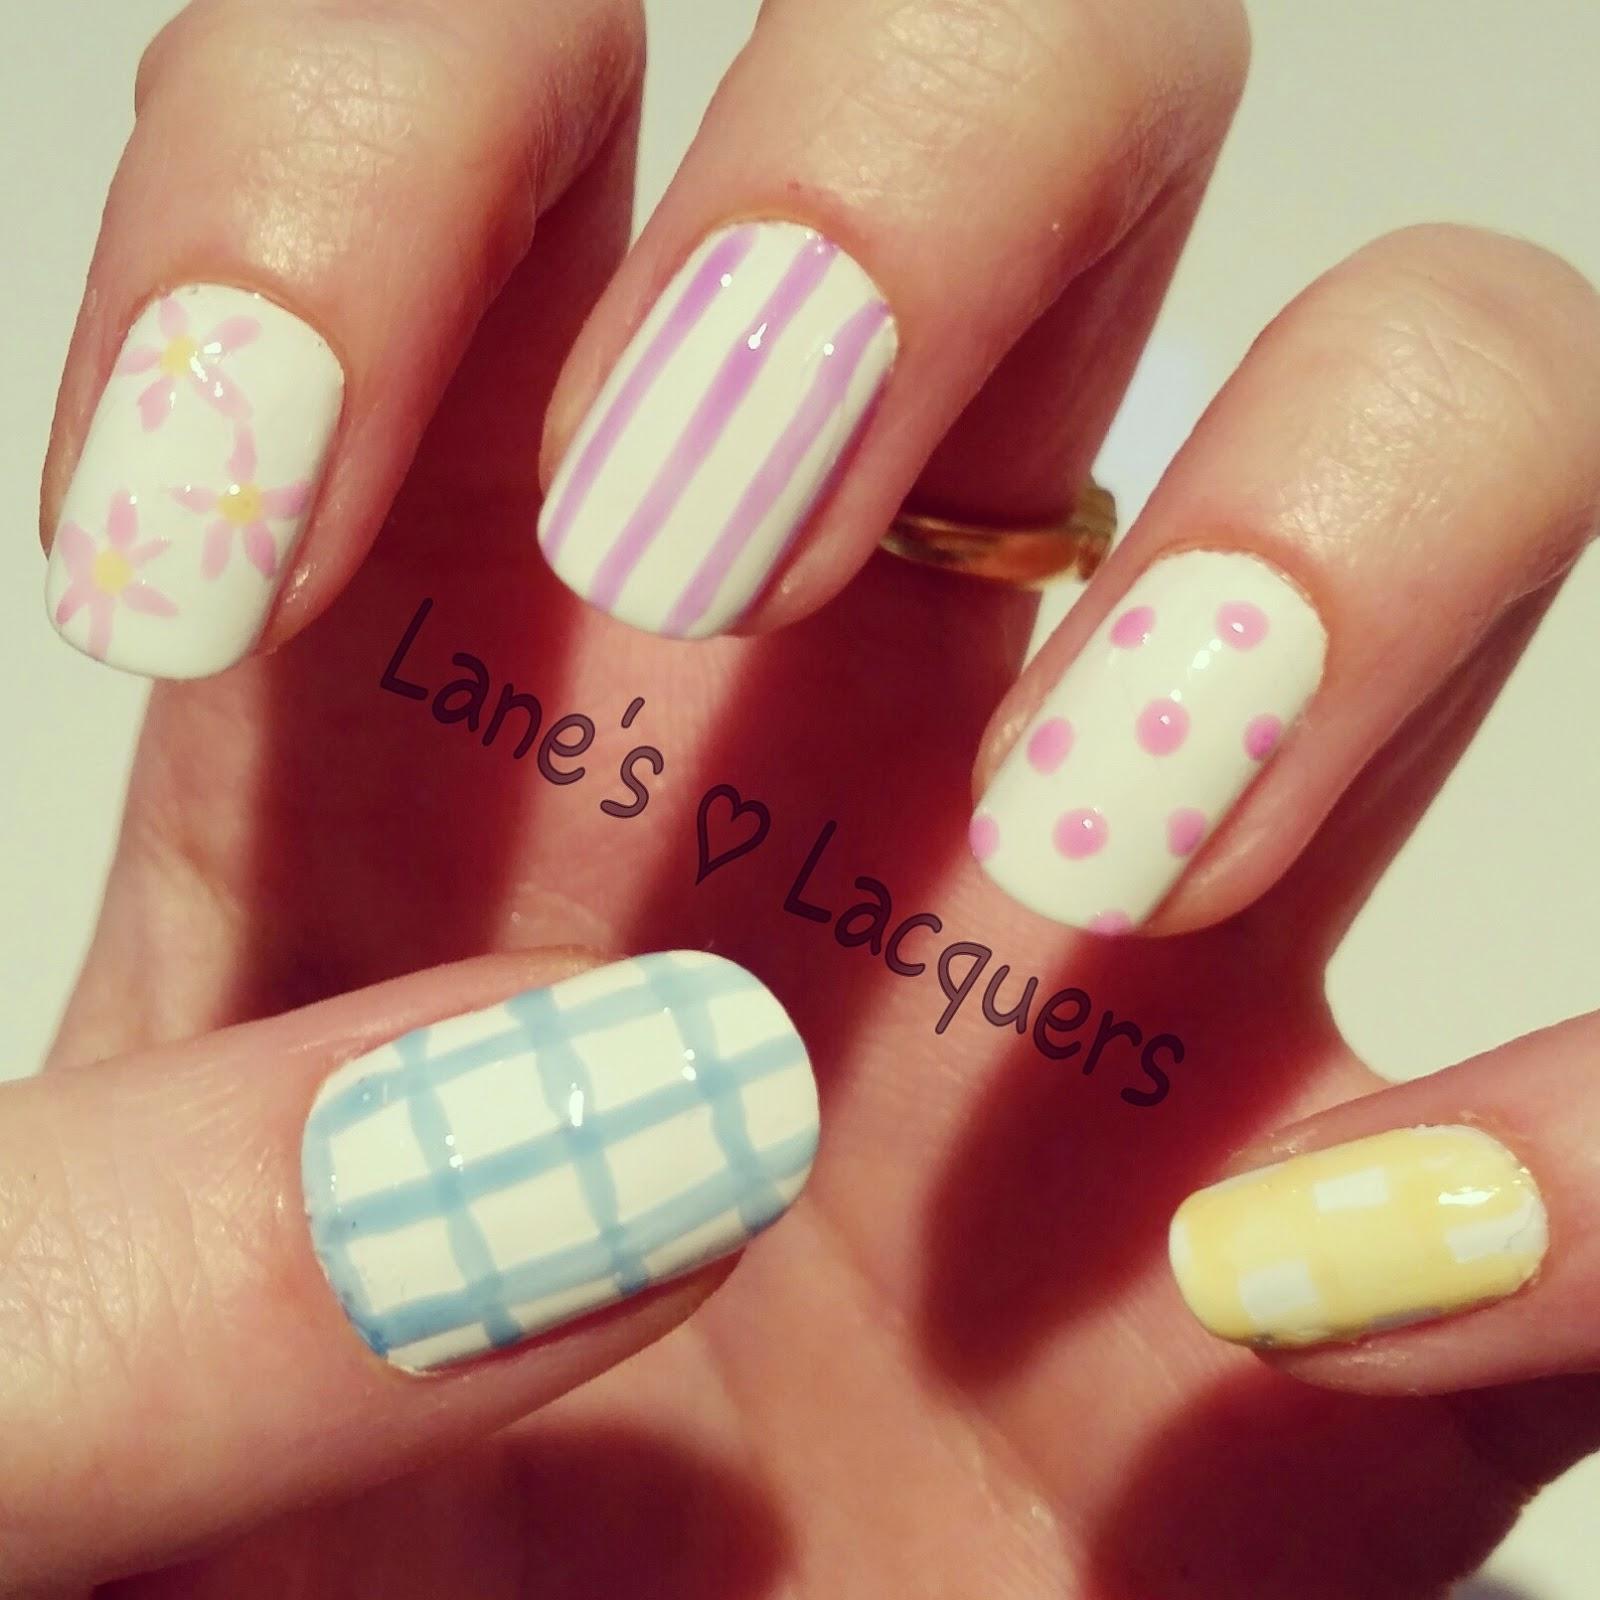 opi-sheer-tints-freehand-spring-pattern-skittle-nail-art